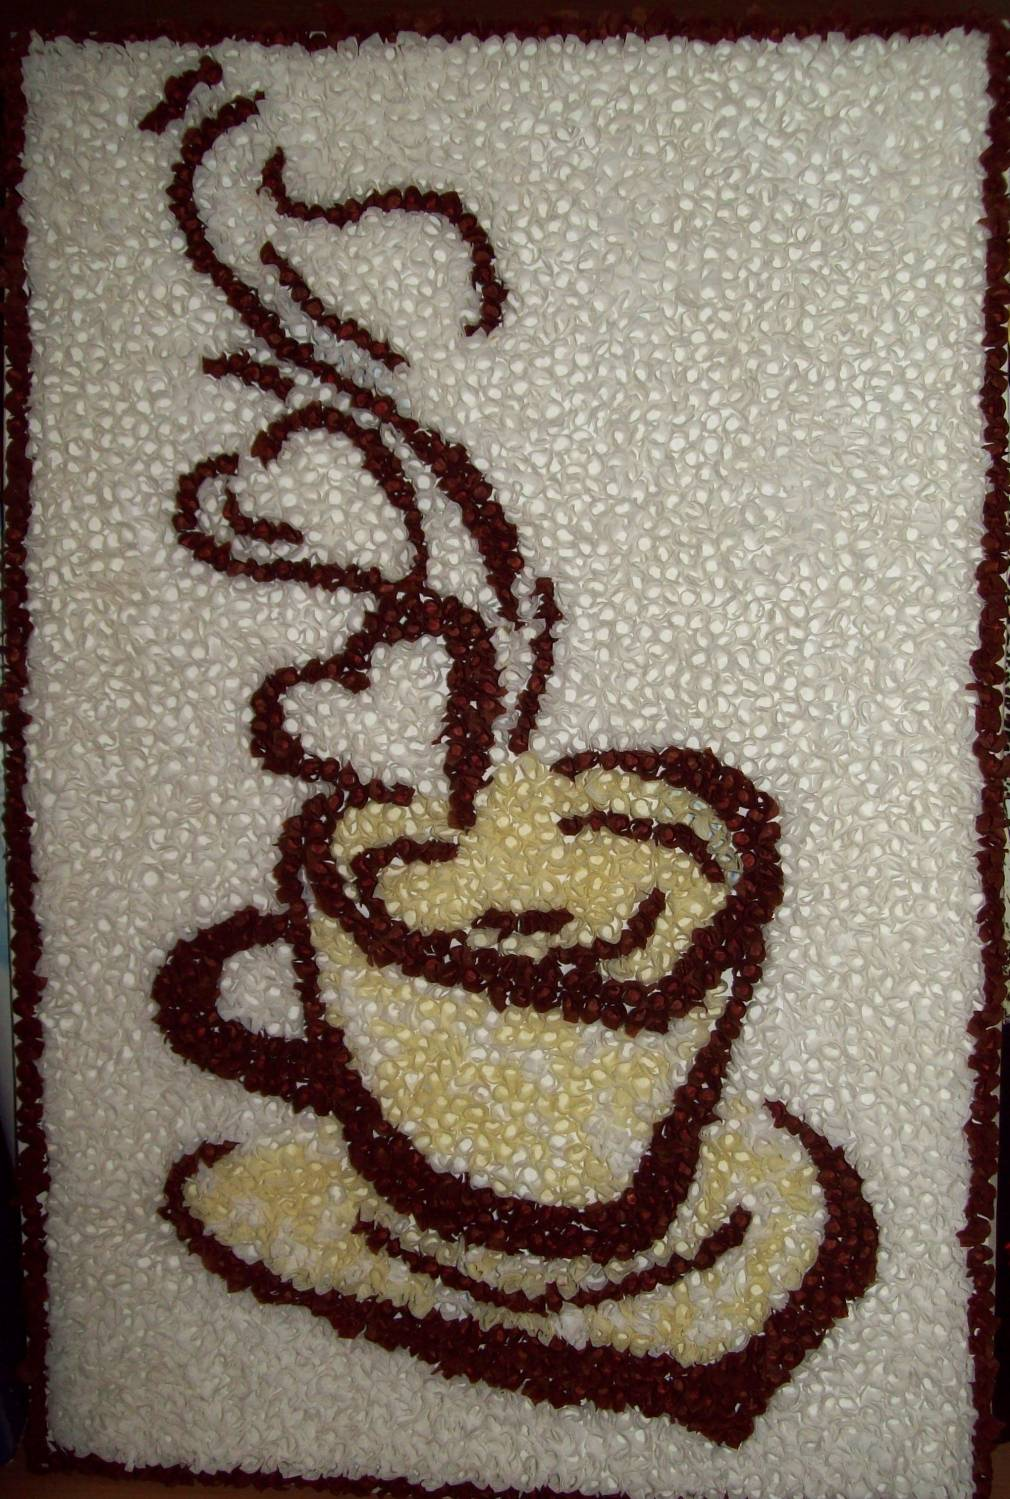 Чашка с кофе фото схема